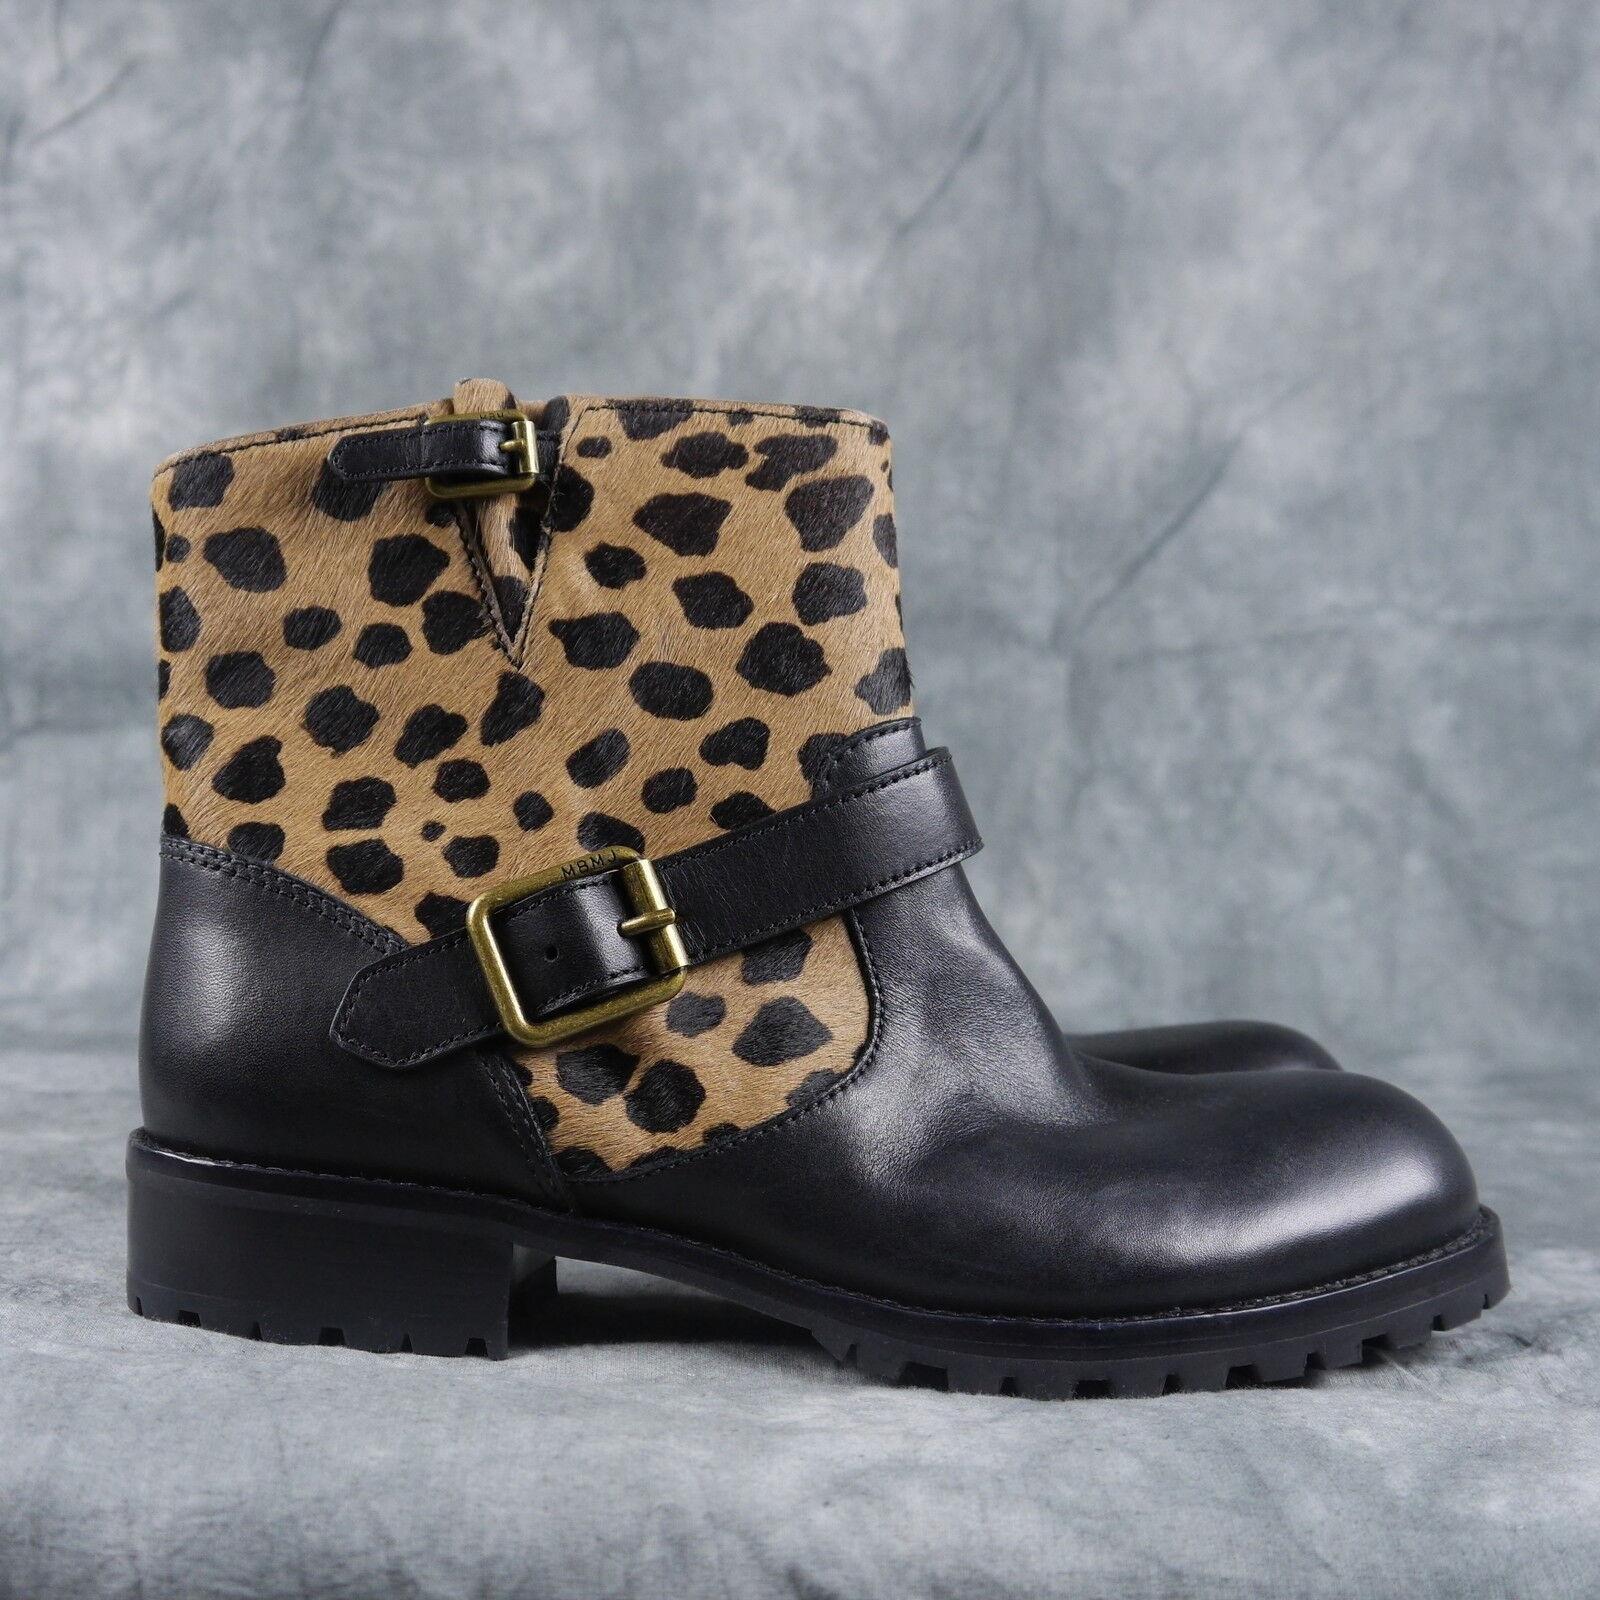 Marc Jacobs mbmj Clásico Clásico Clásico Tobillo botas Talla 38.5  398 Negro Cuero animal Print ANB  descuento